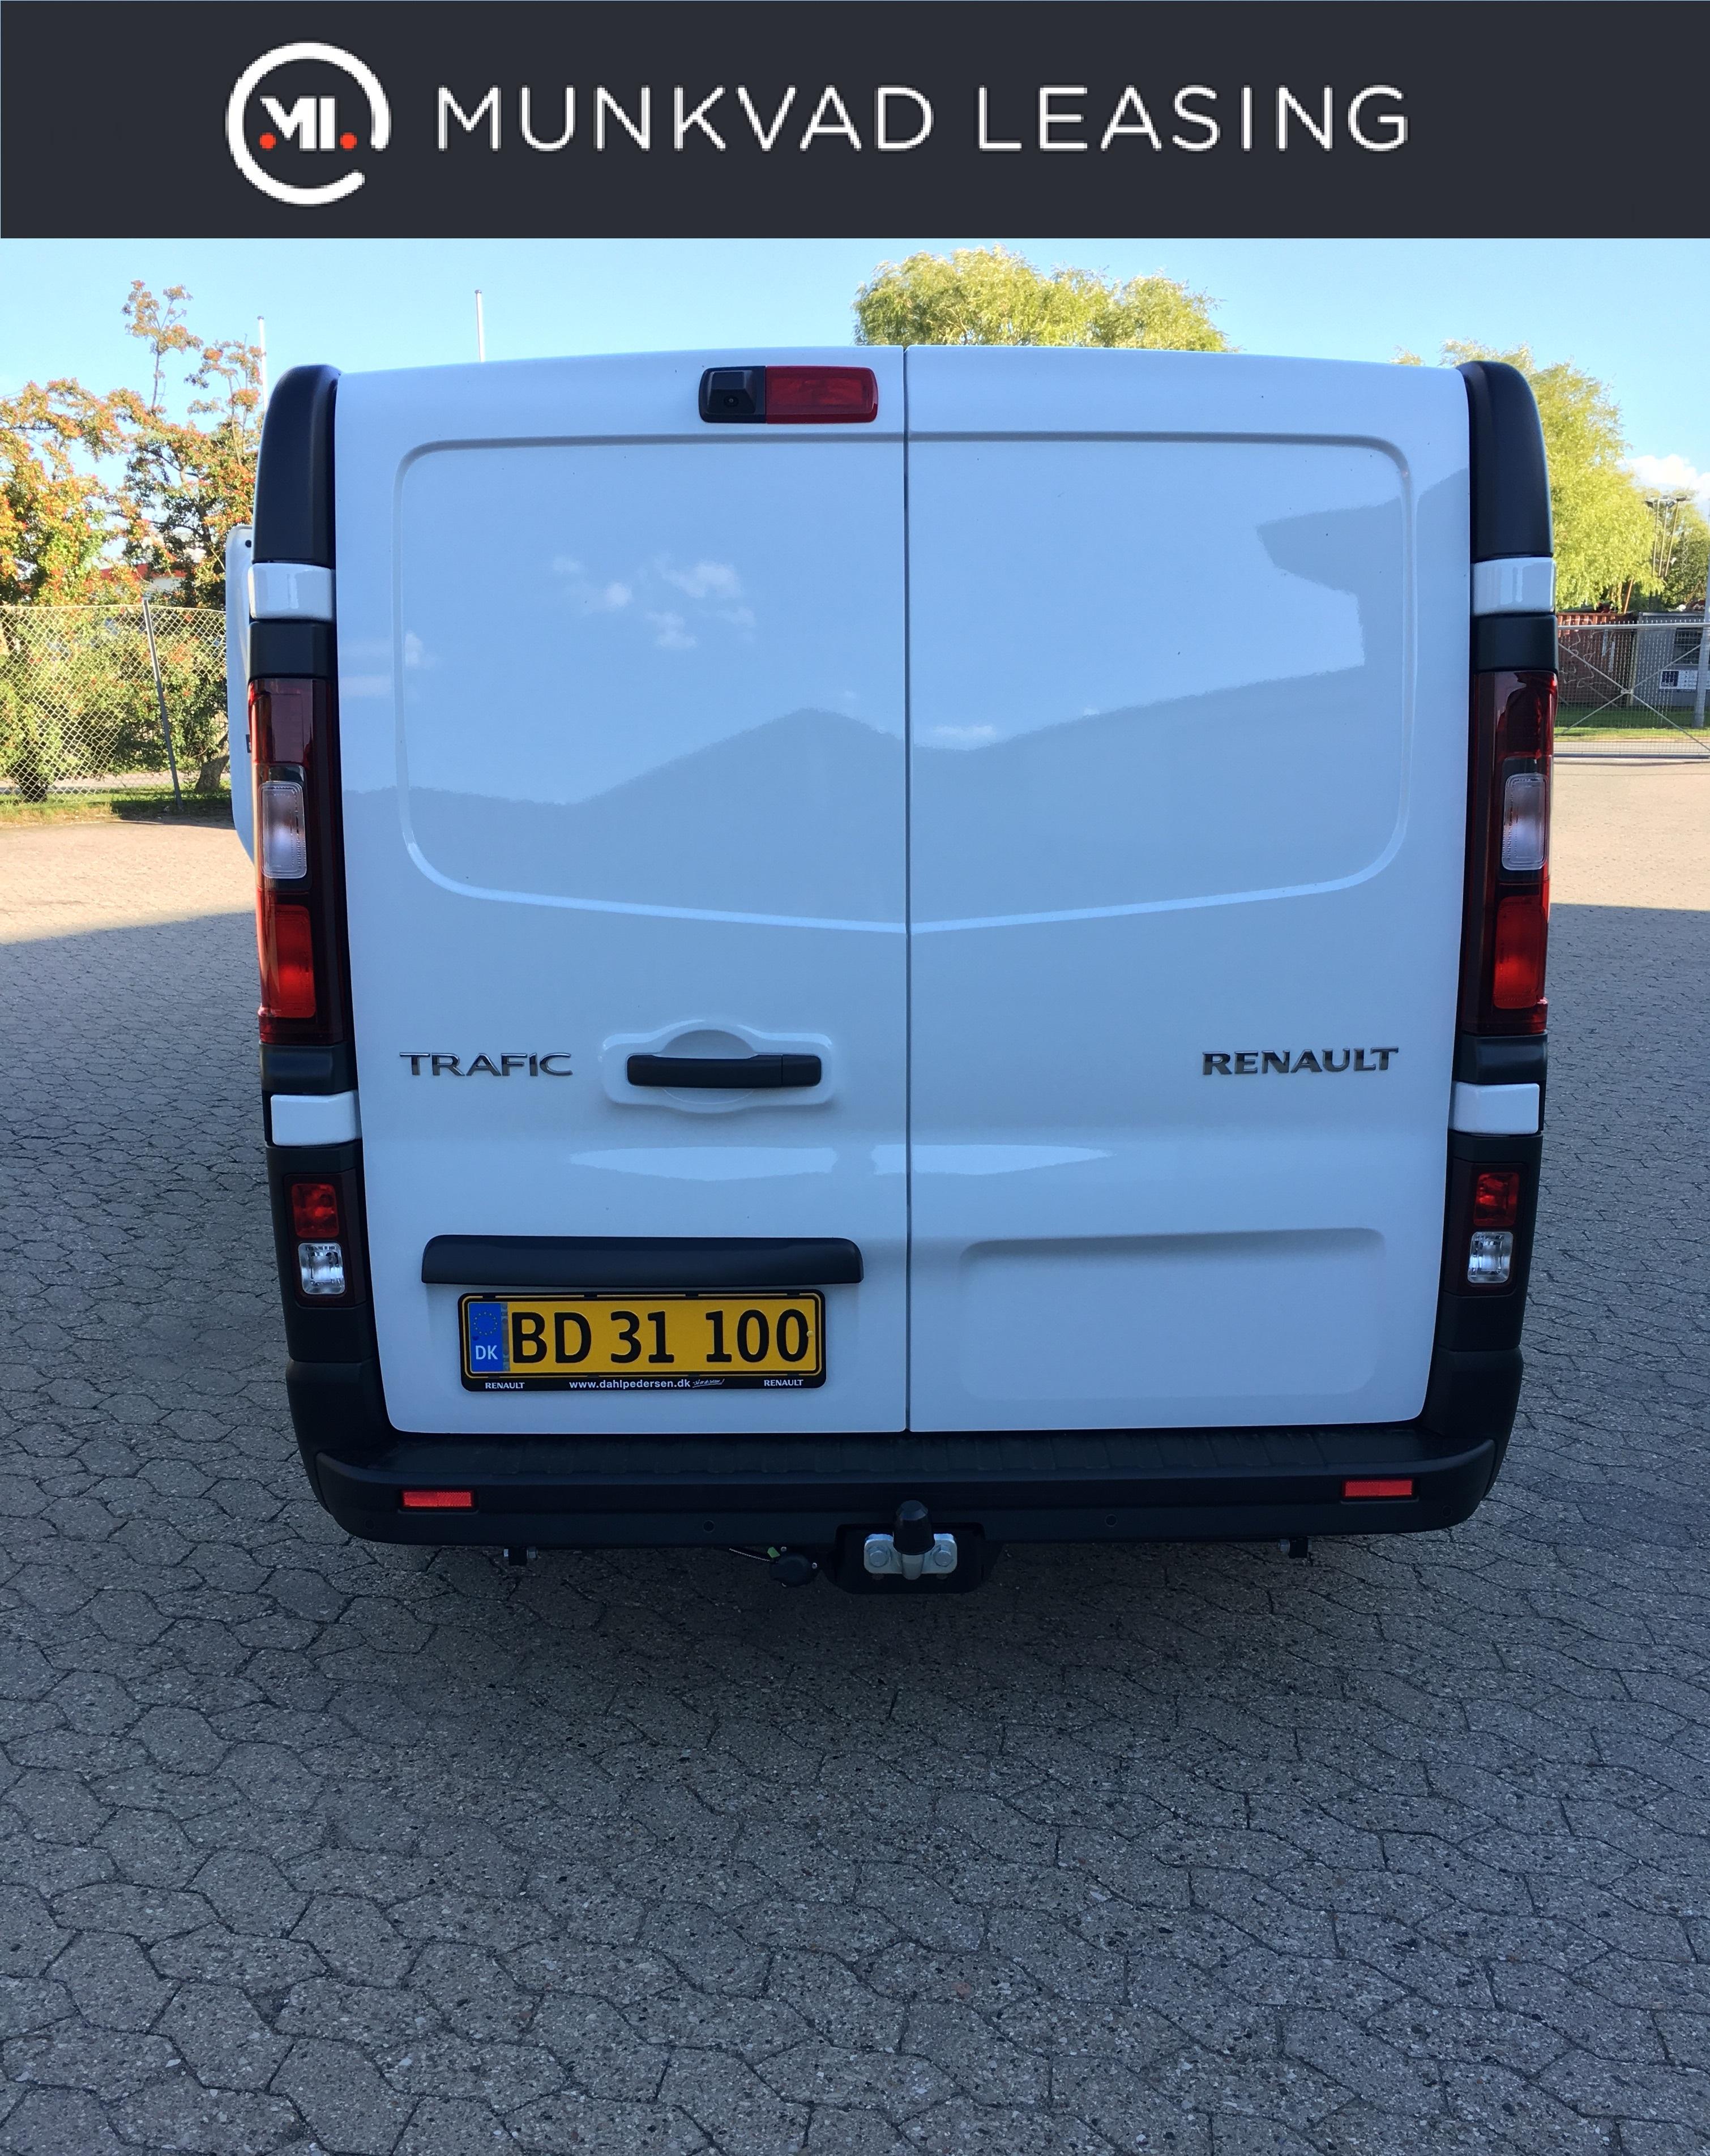 Leasing af Renault Trafic 1,6 120 HK L2H1   Munkvad Leasing